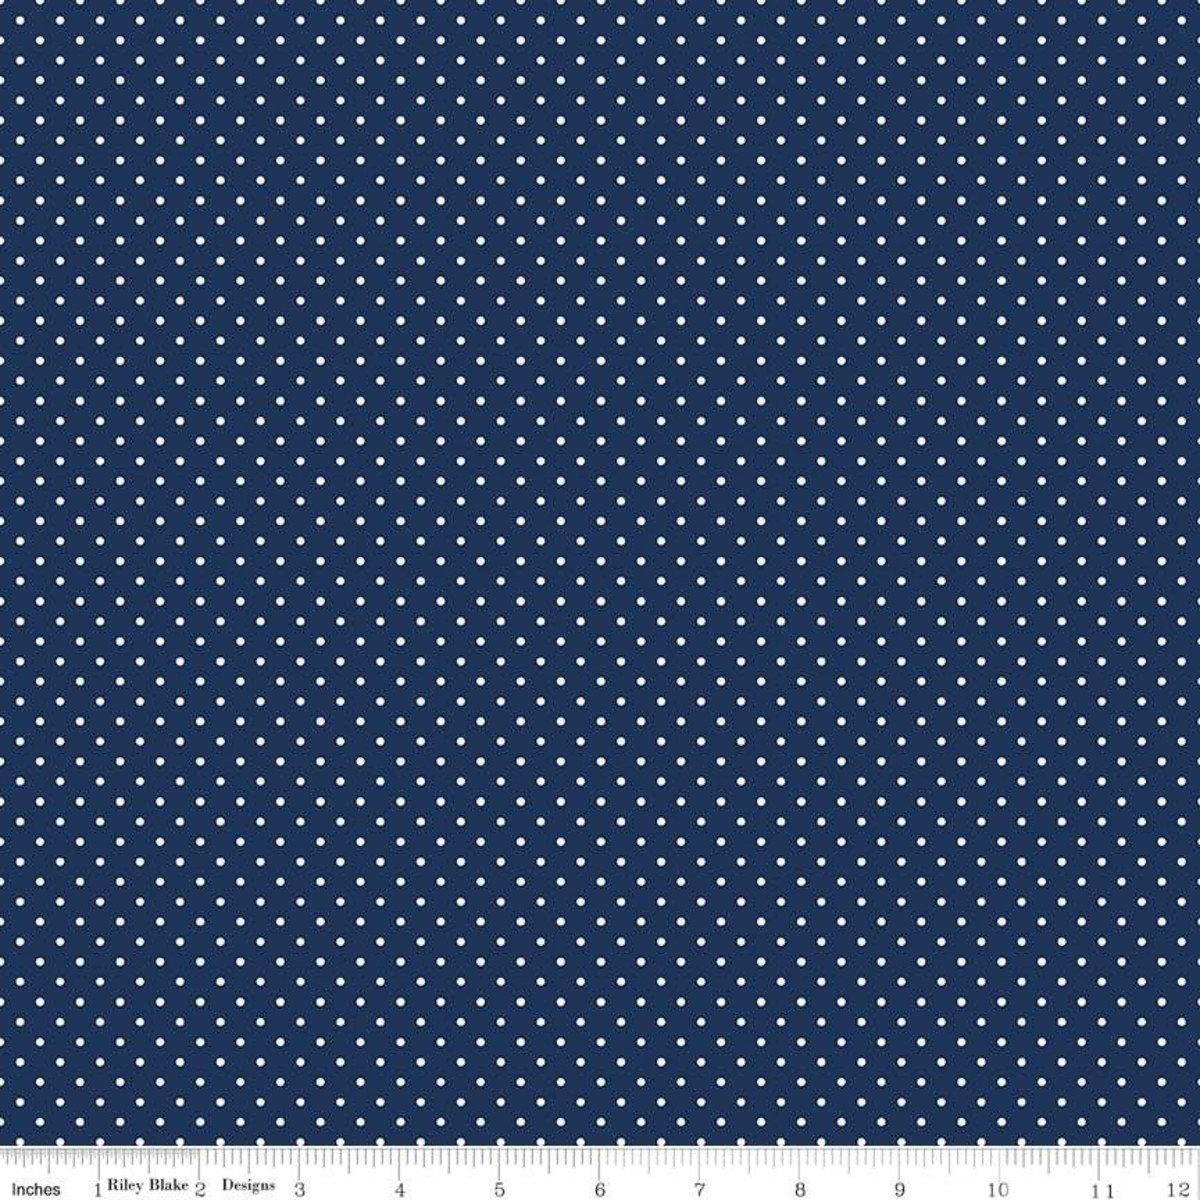 Riley Blake Designs, Swiss Dot - Swiss Dot Navy